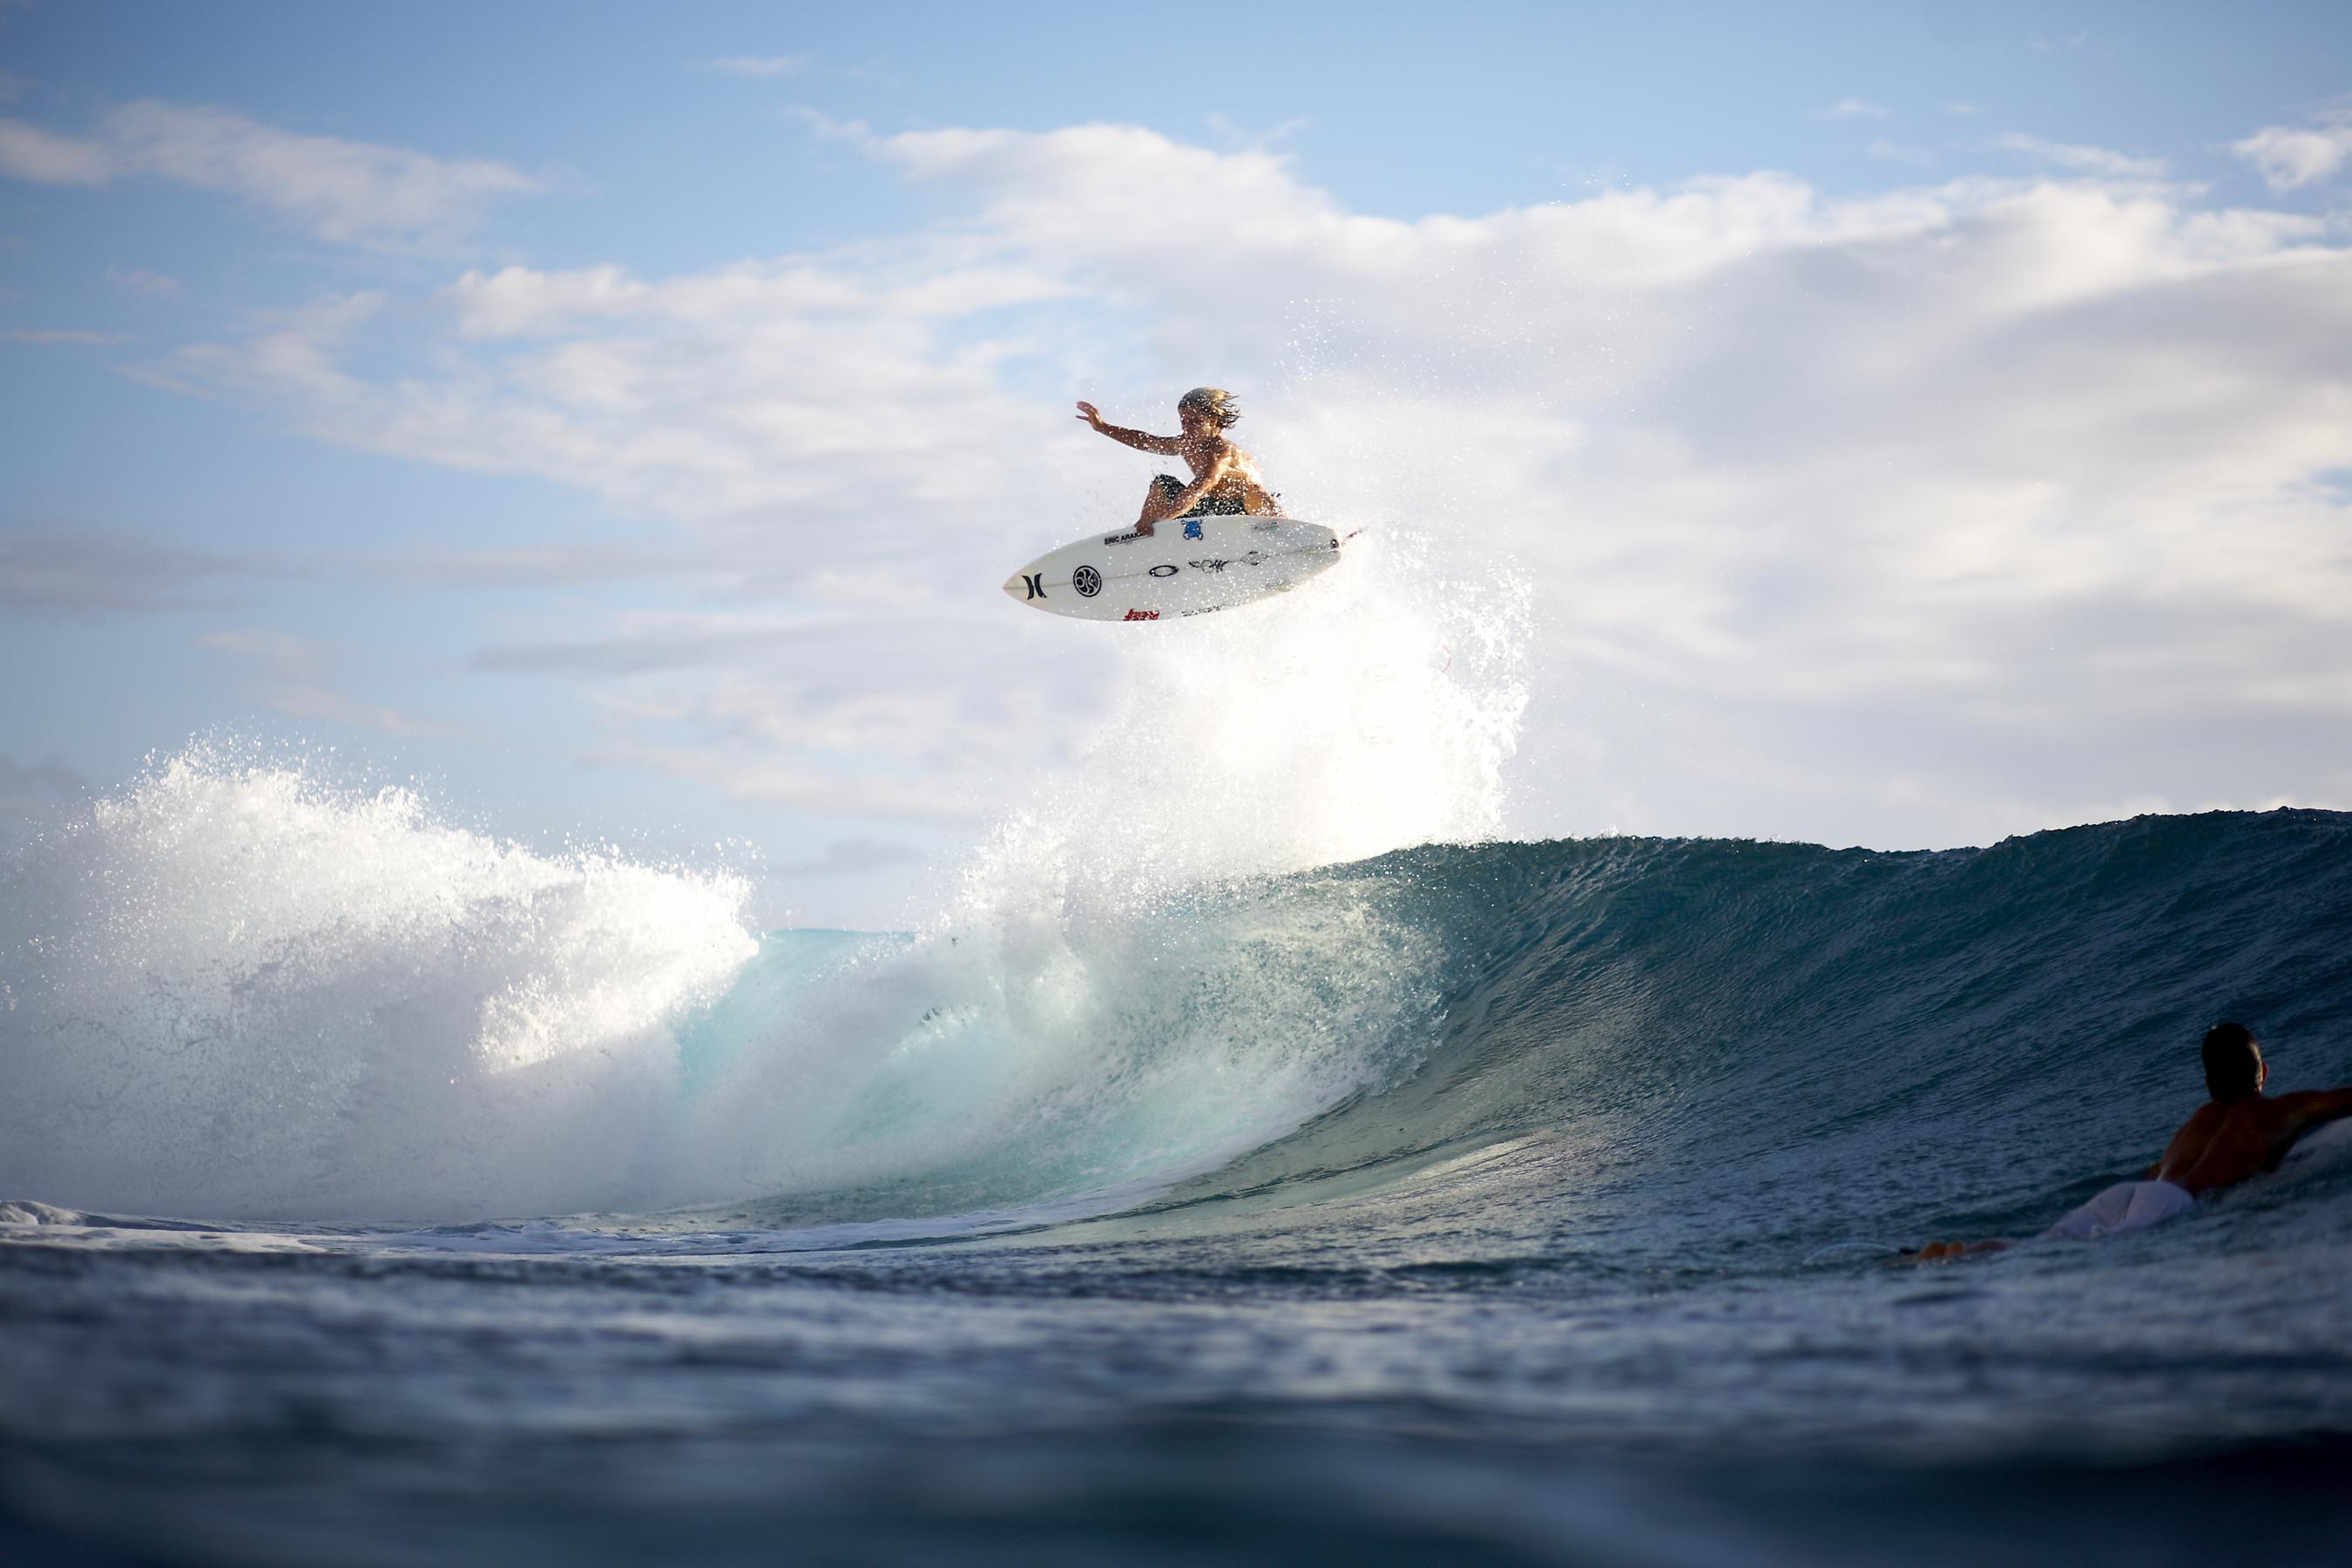 Desktop Surfing HD Wallpapers 2700x1800